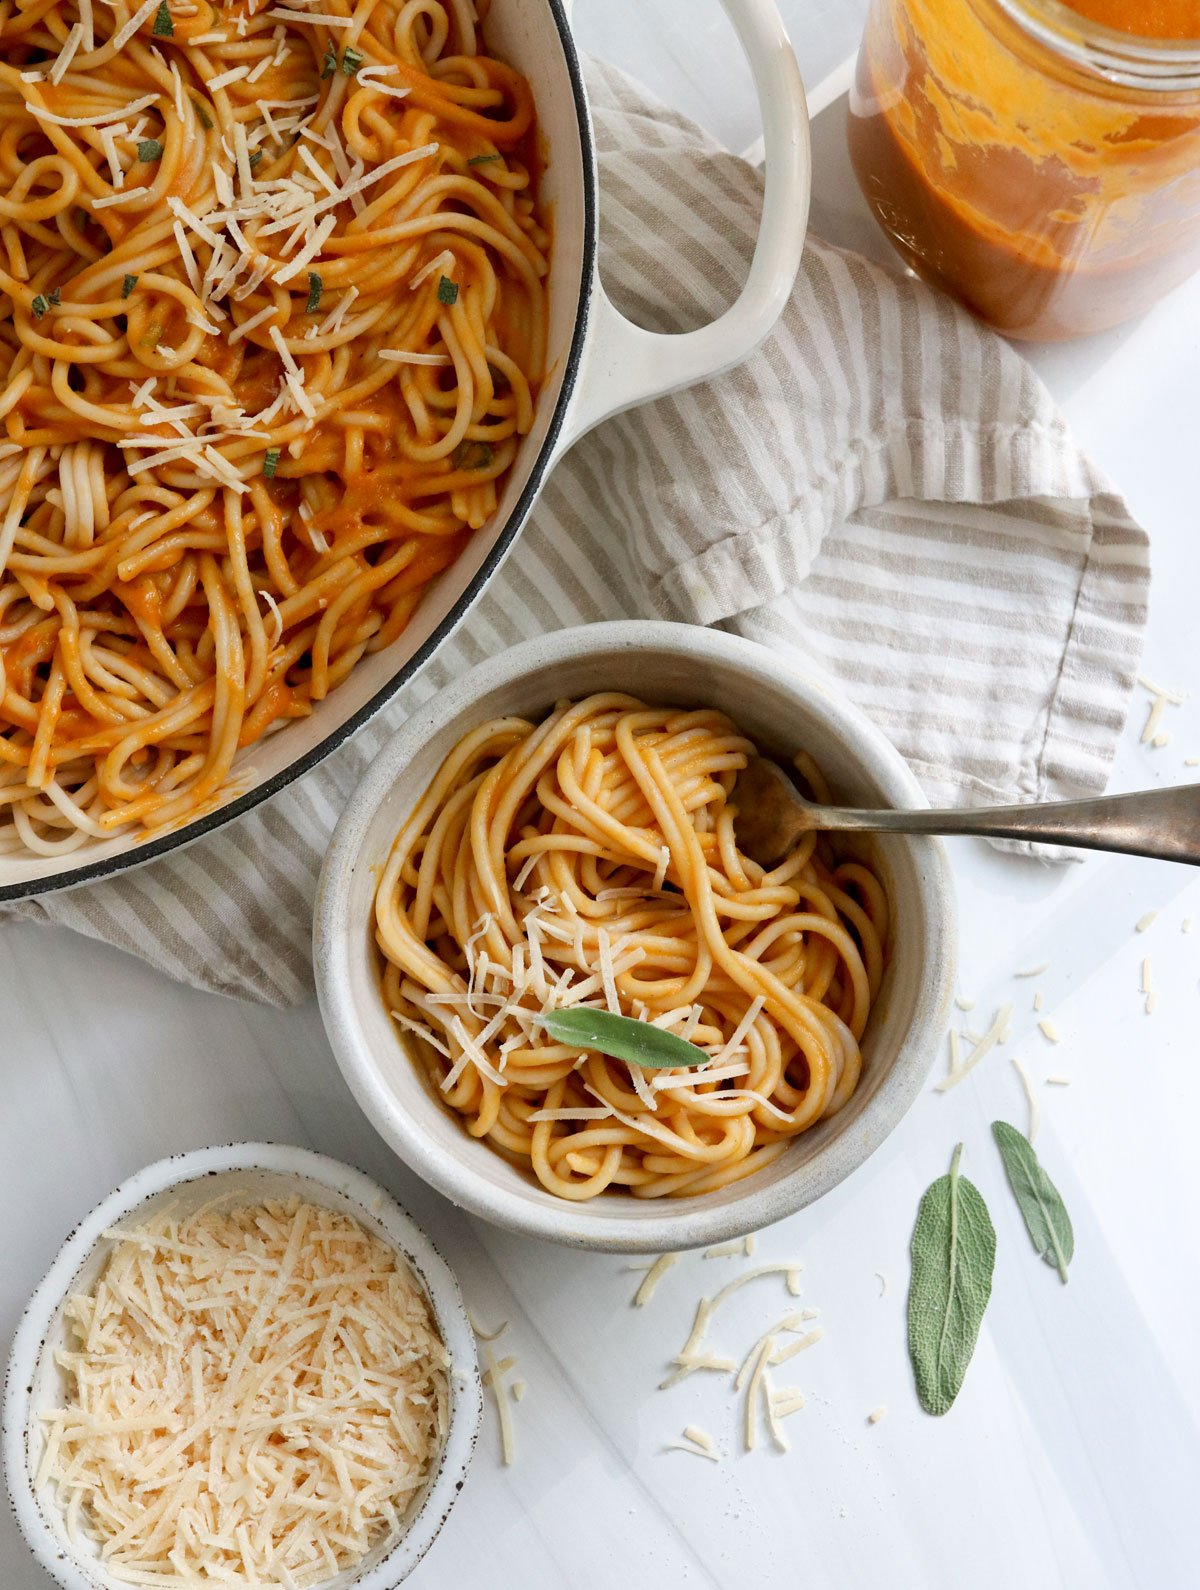 bowl of pumpkin pasta next to a white skillet